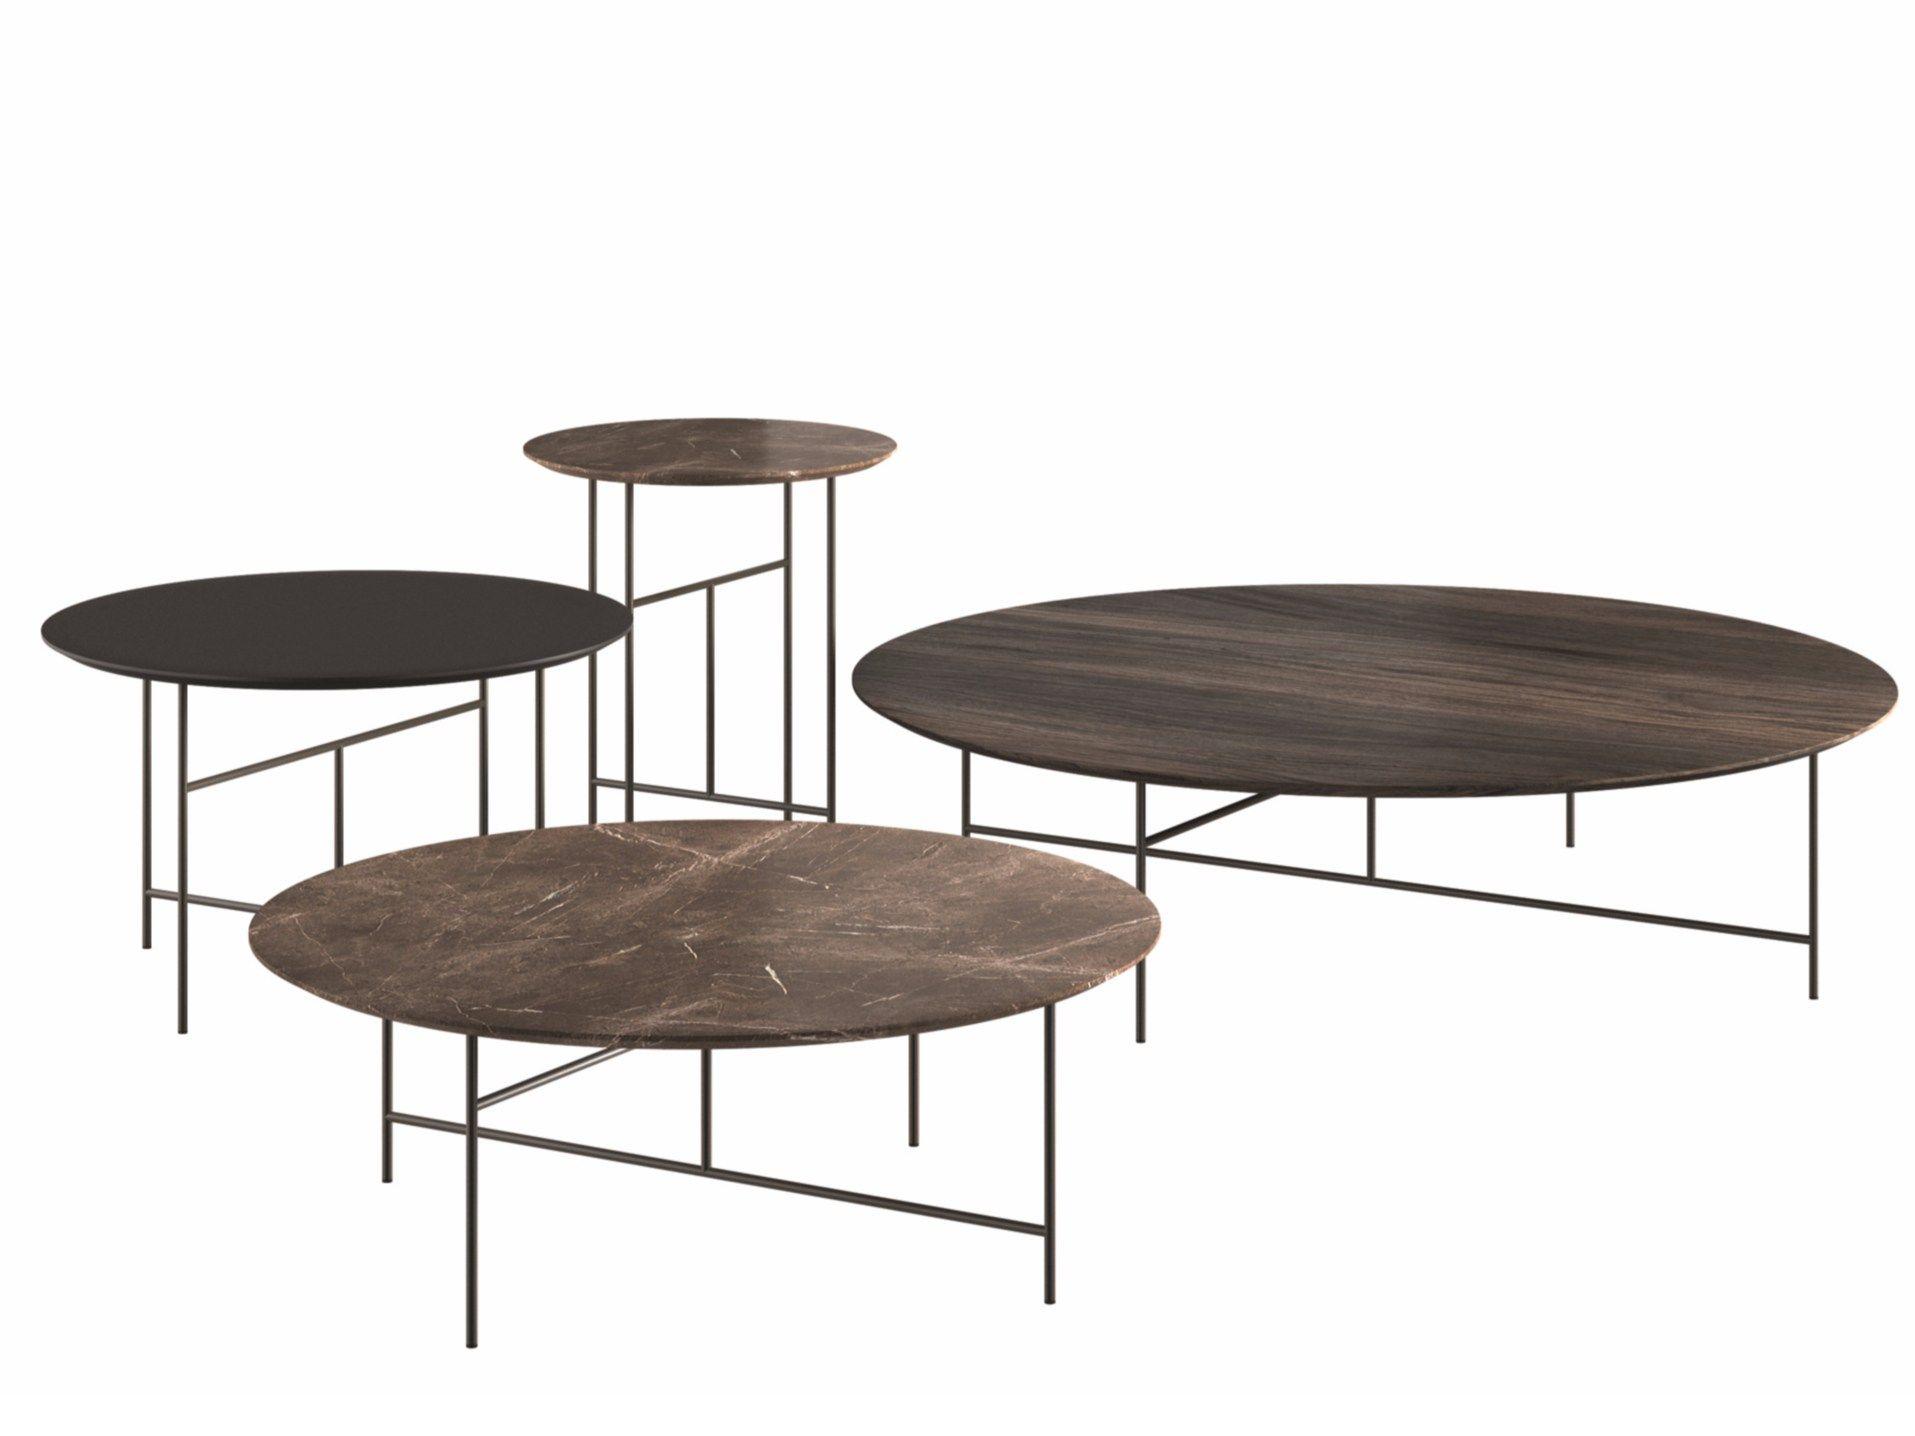 Contemporary Style Round Coffee Table Sen By De Padova Design